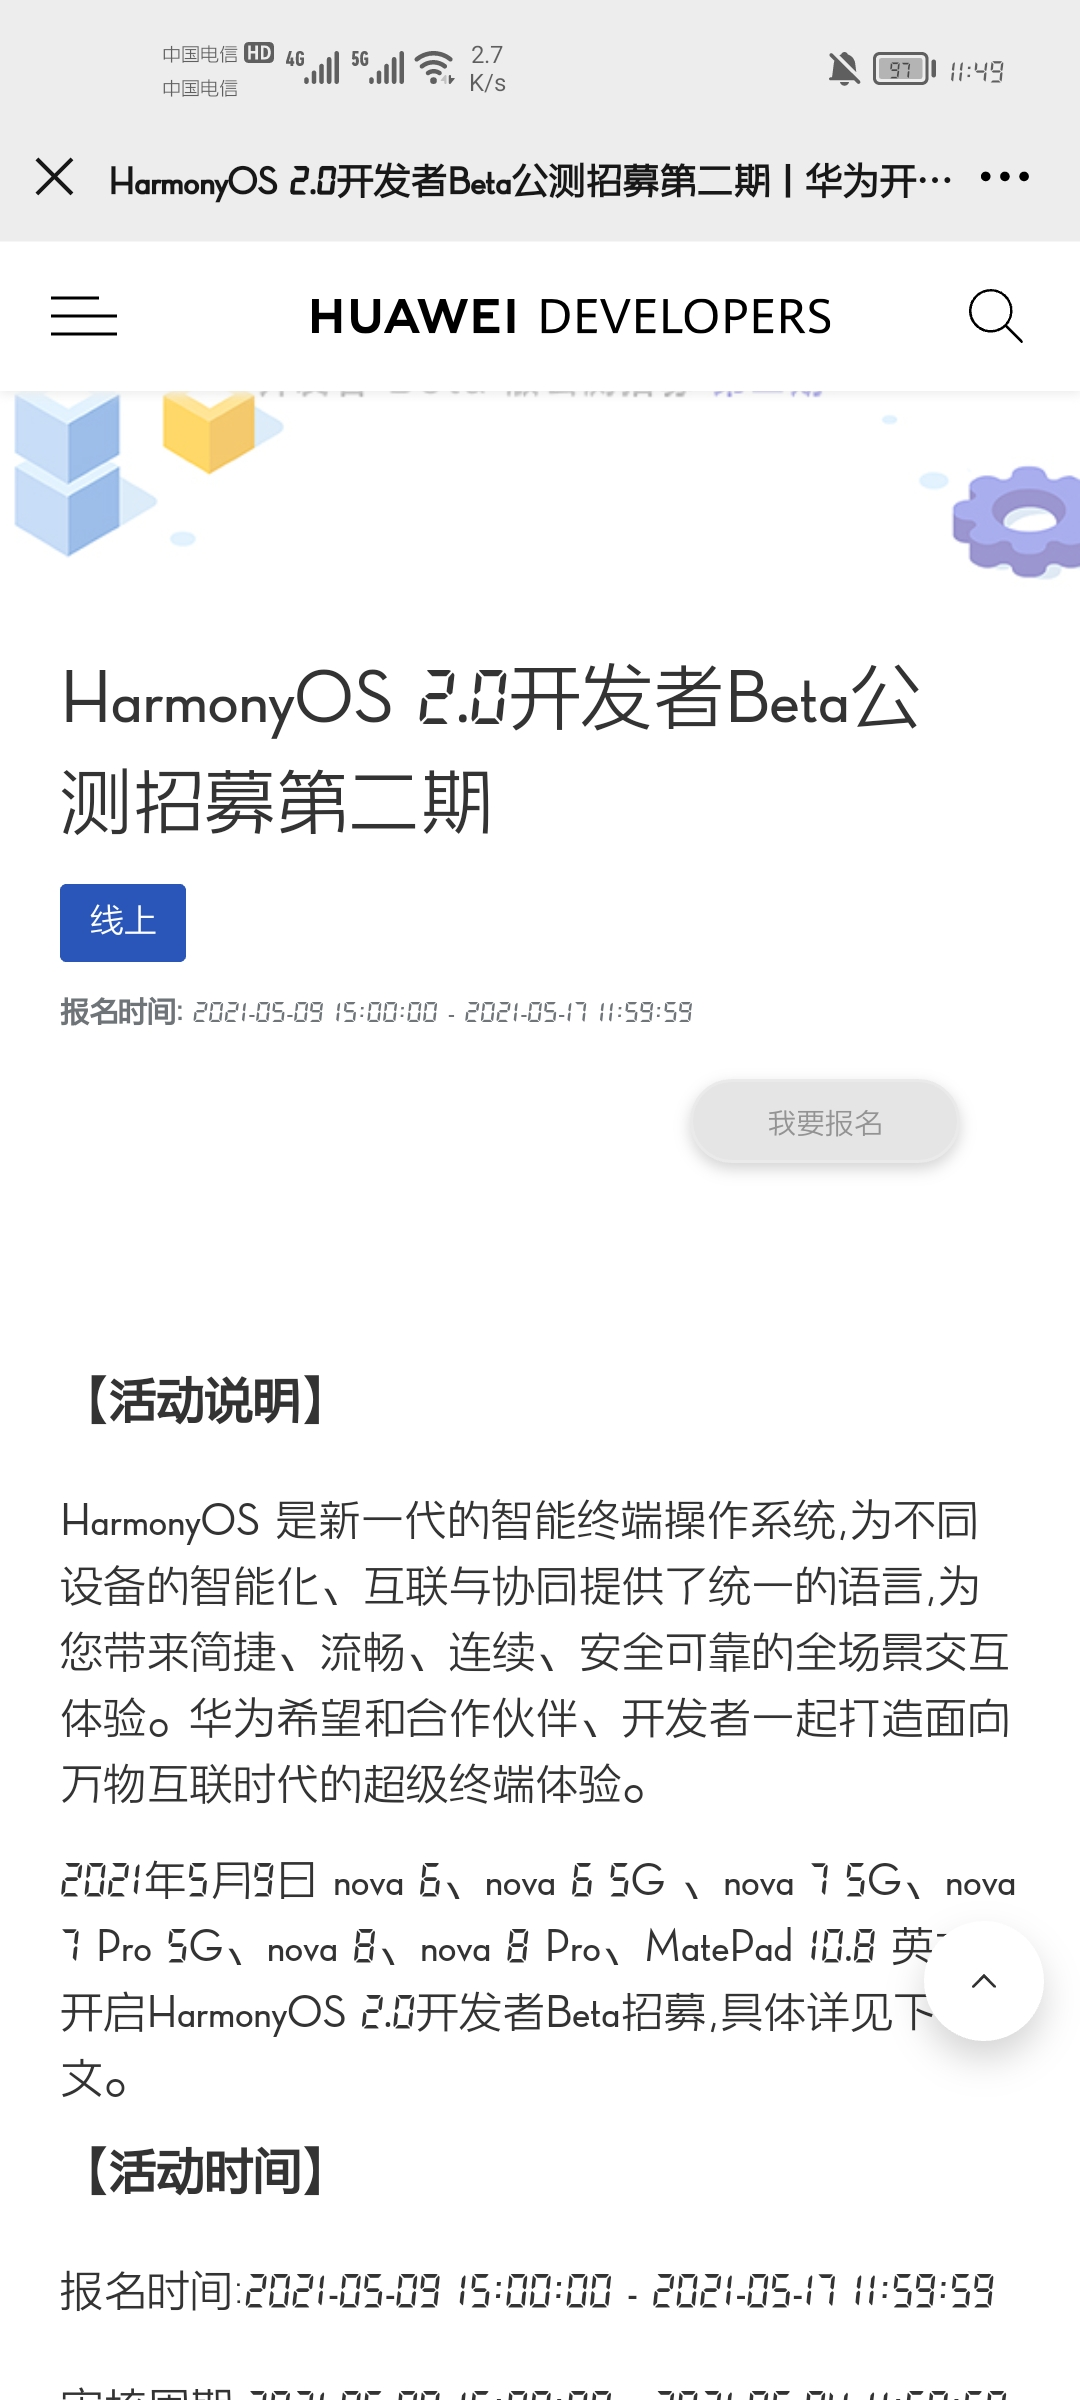 Screenshot_20210625_114945_com.tencent.mm.jpg